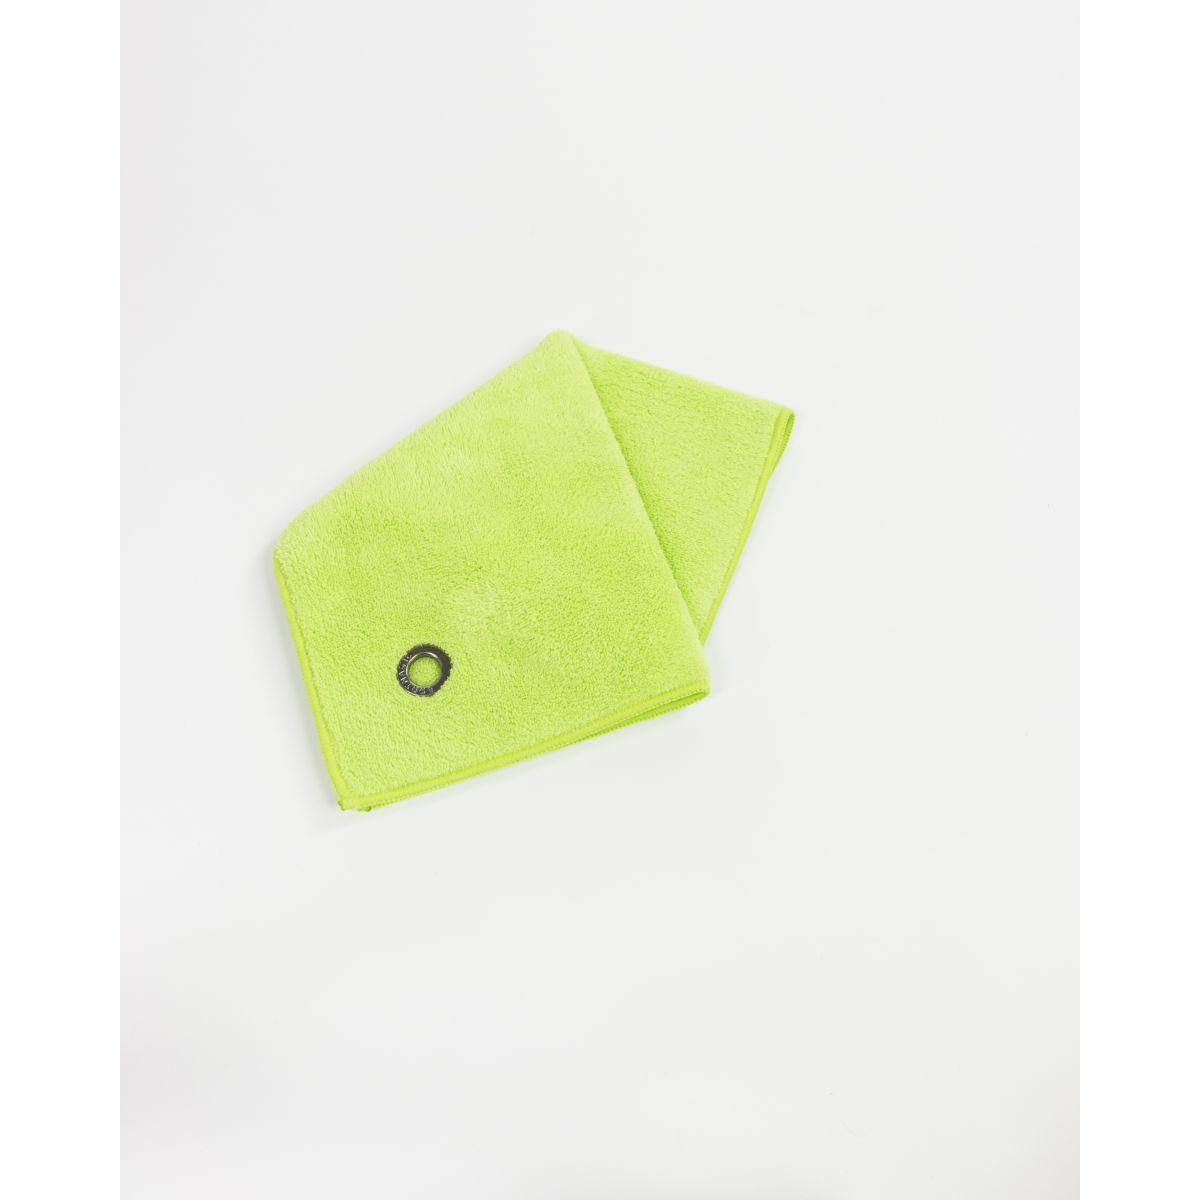 serviette mains visage microfibre vaianu vert lime bodynamic. Black Bedroom Furniture Sets. Home Design Ideas